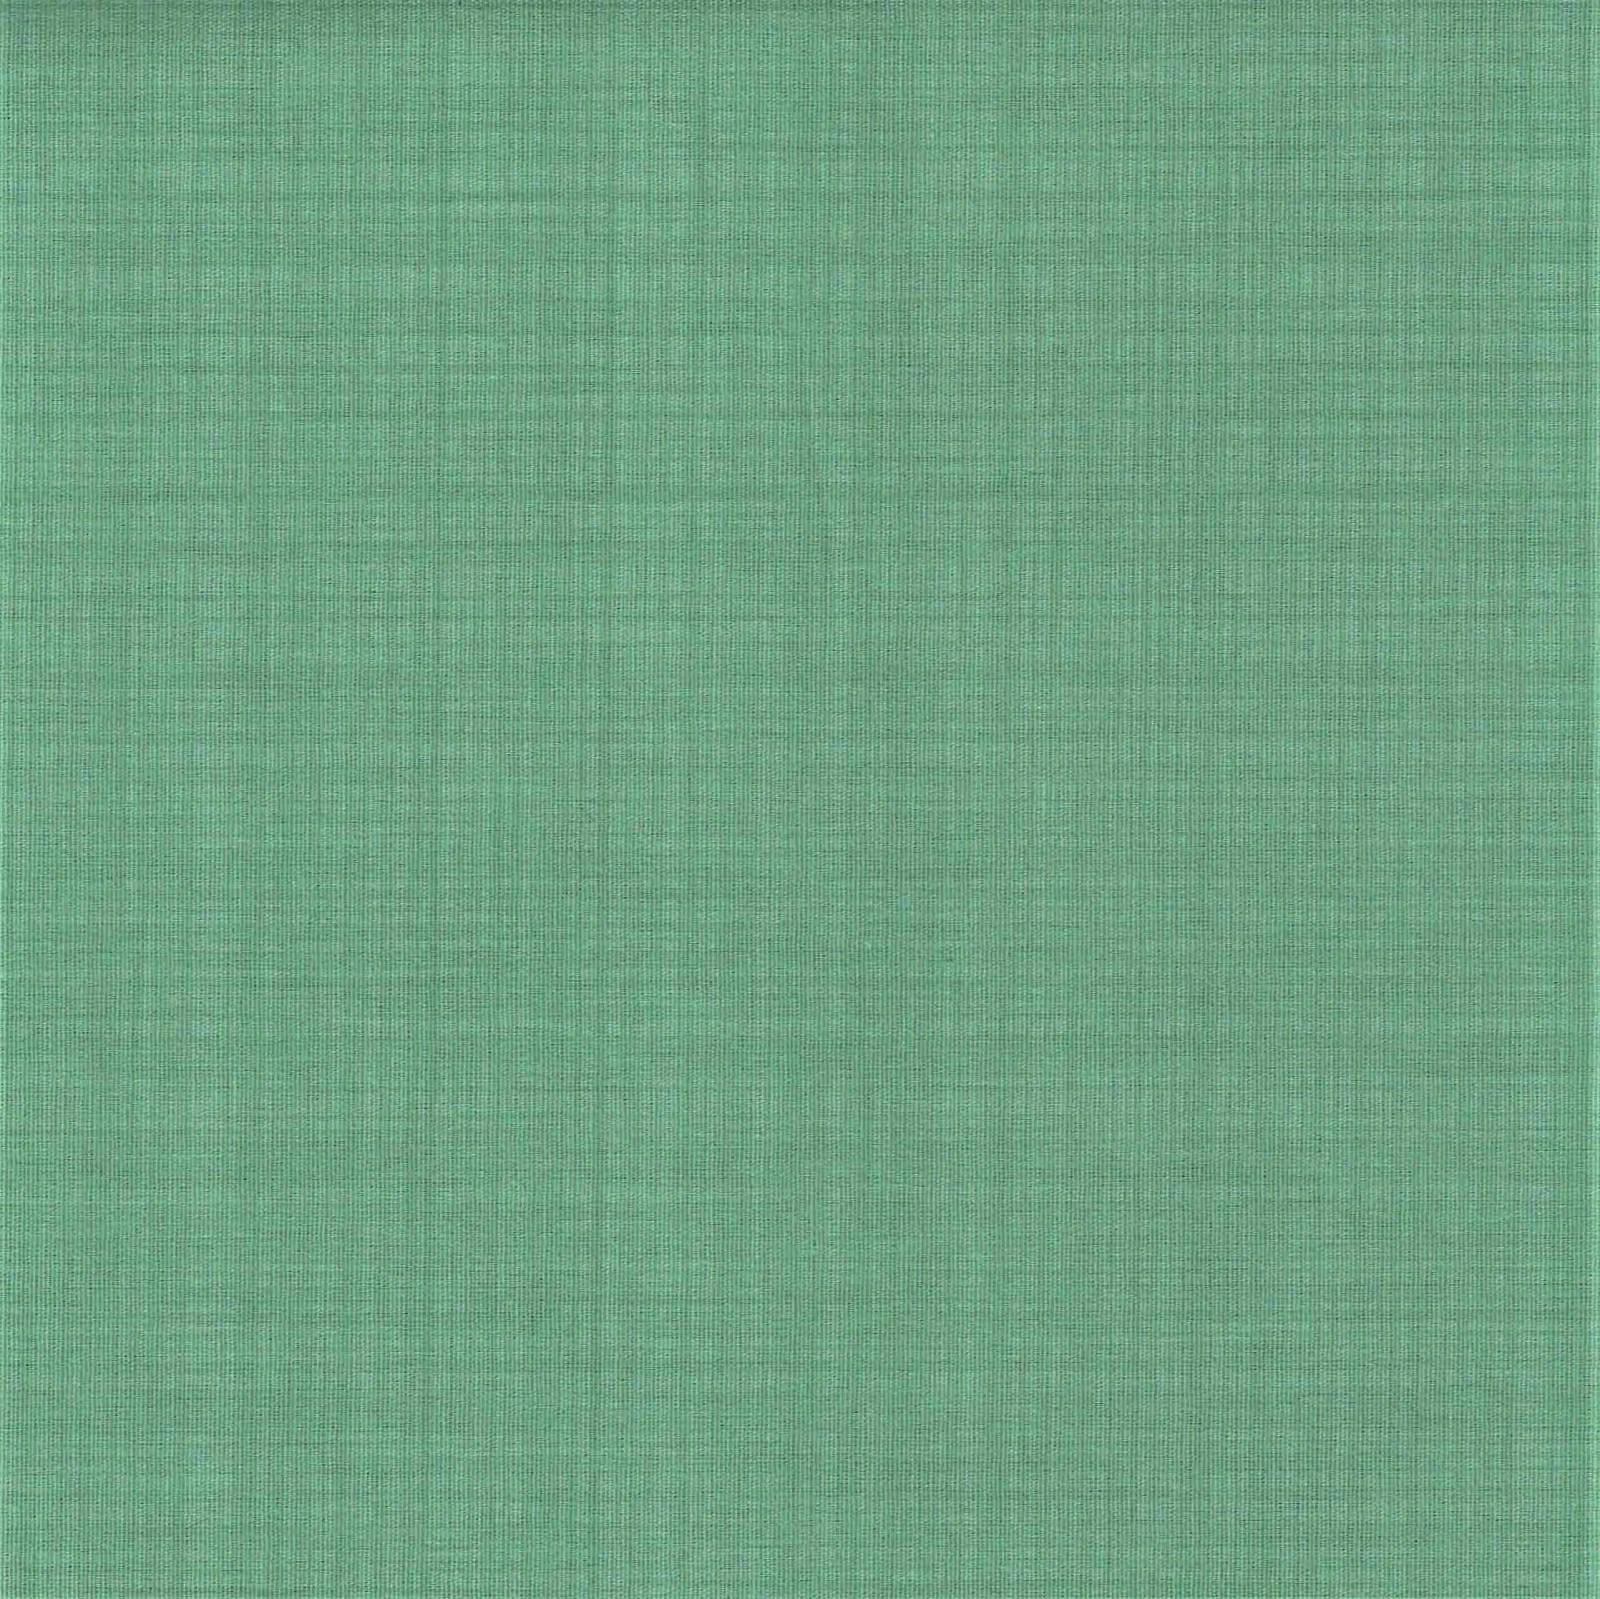 Textura Riscada Verde Seco Ref.1292 cor 02 Peripan - Armarinhos Nodari